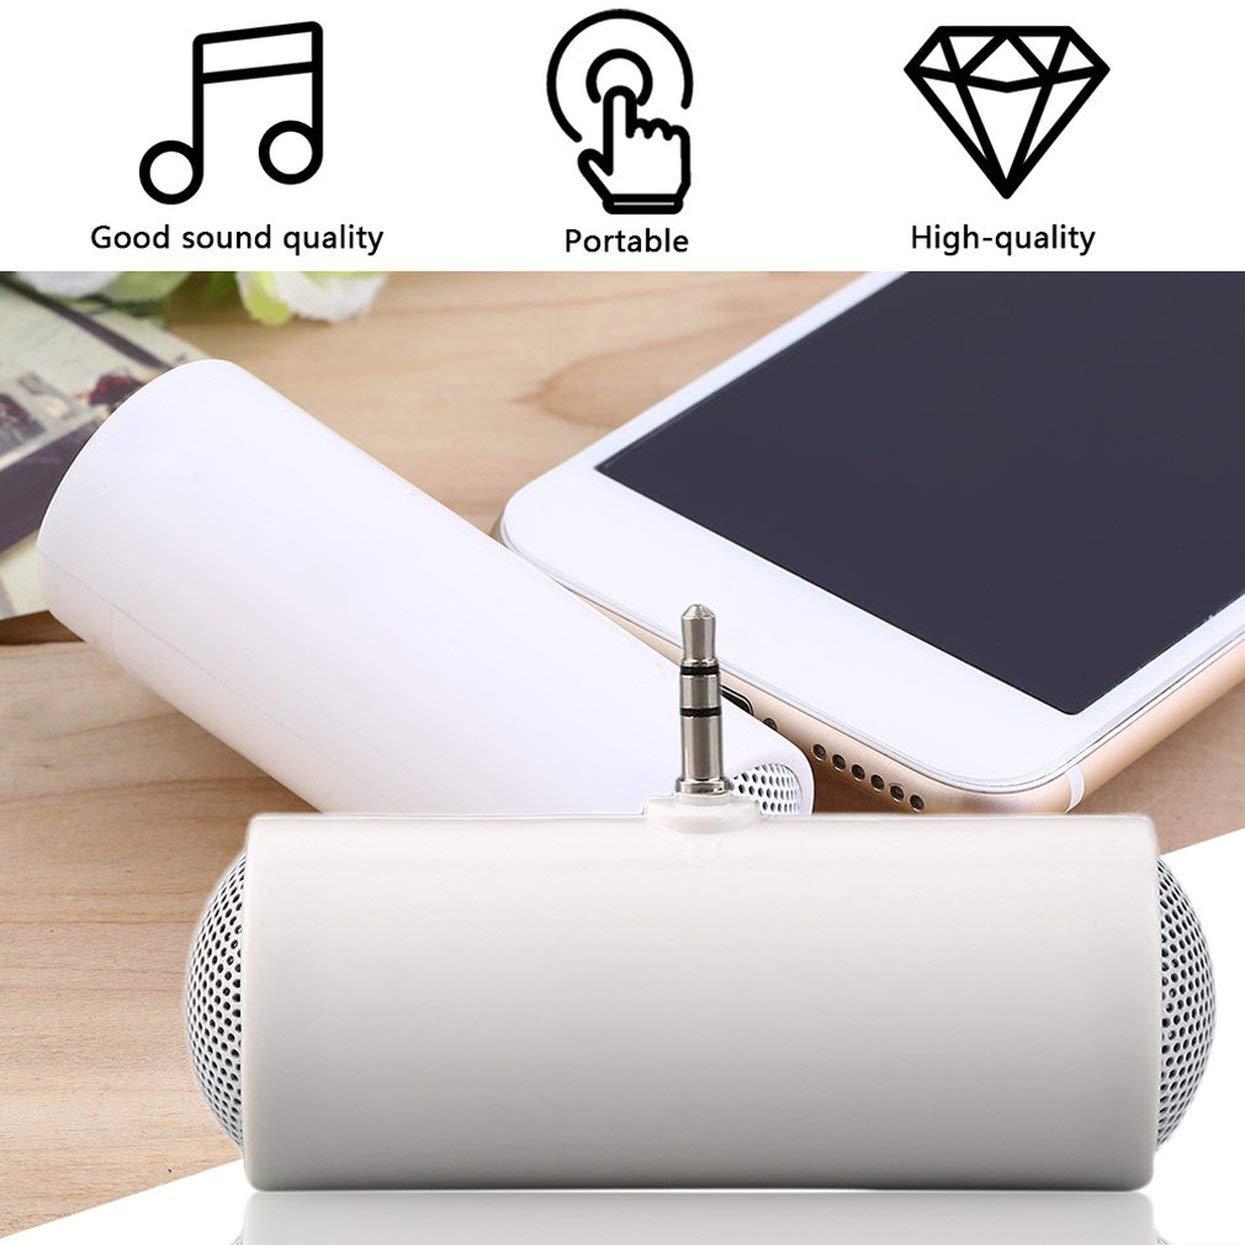 Detectorcatty Newest Stereo Mini Speaker MP3 Player Amplifier Loudspeaker for Mobile Phone 3.5mm portabledurable White